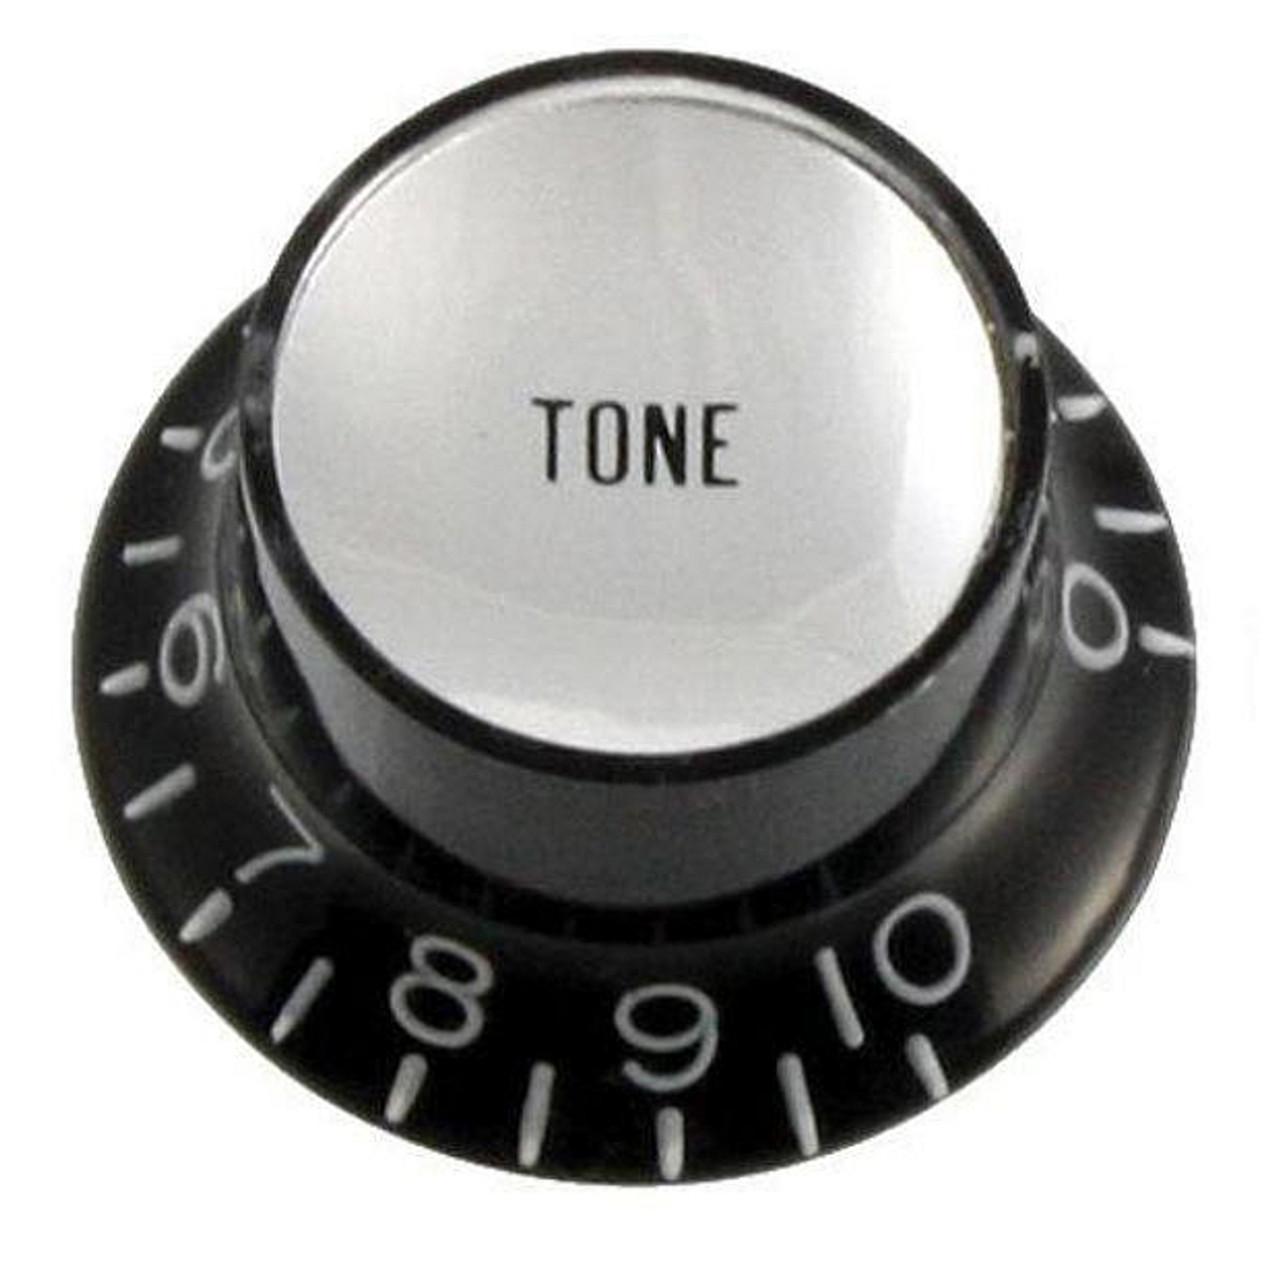 Reflector Cap Tone Knob with Fine Splines-Black